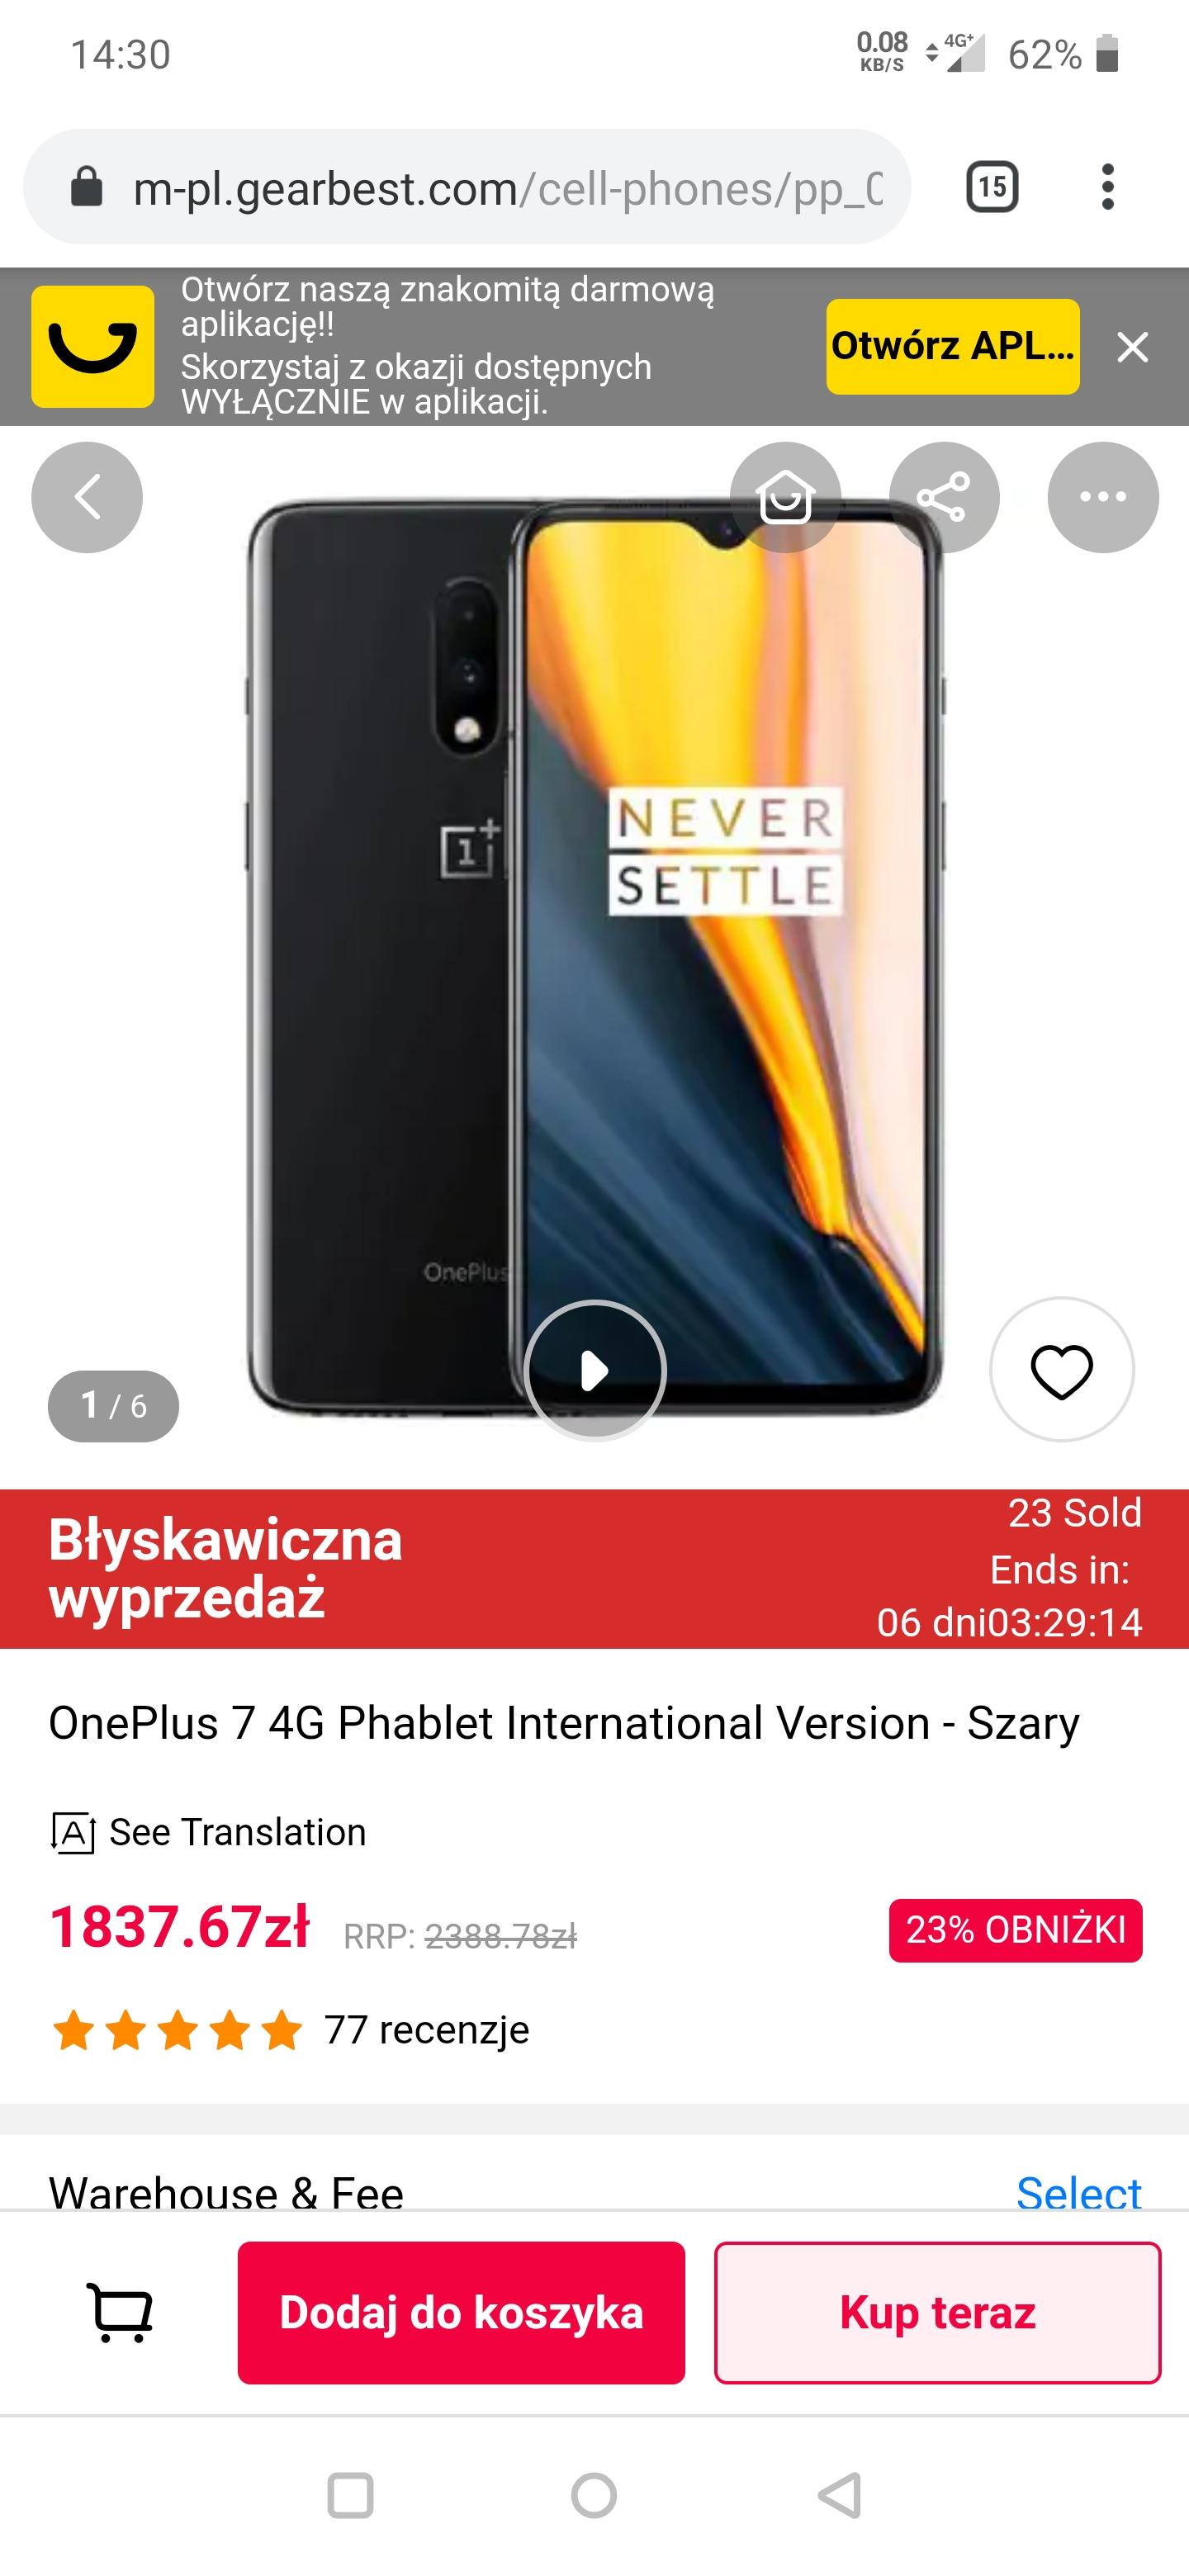 OnePlus 7 8/256 Grey/Red international version